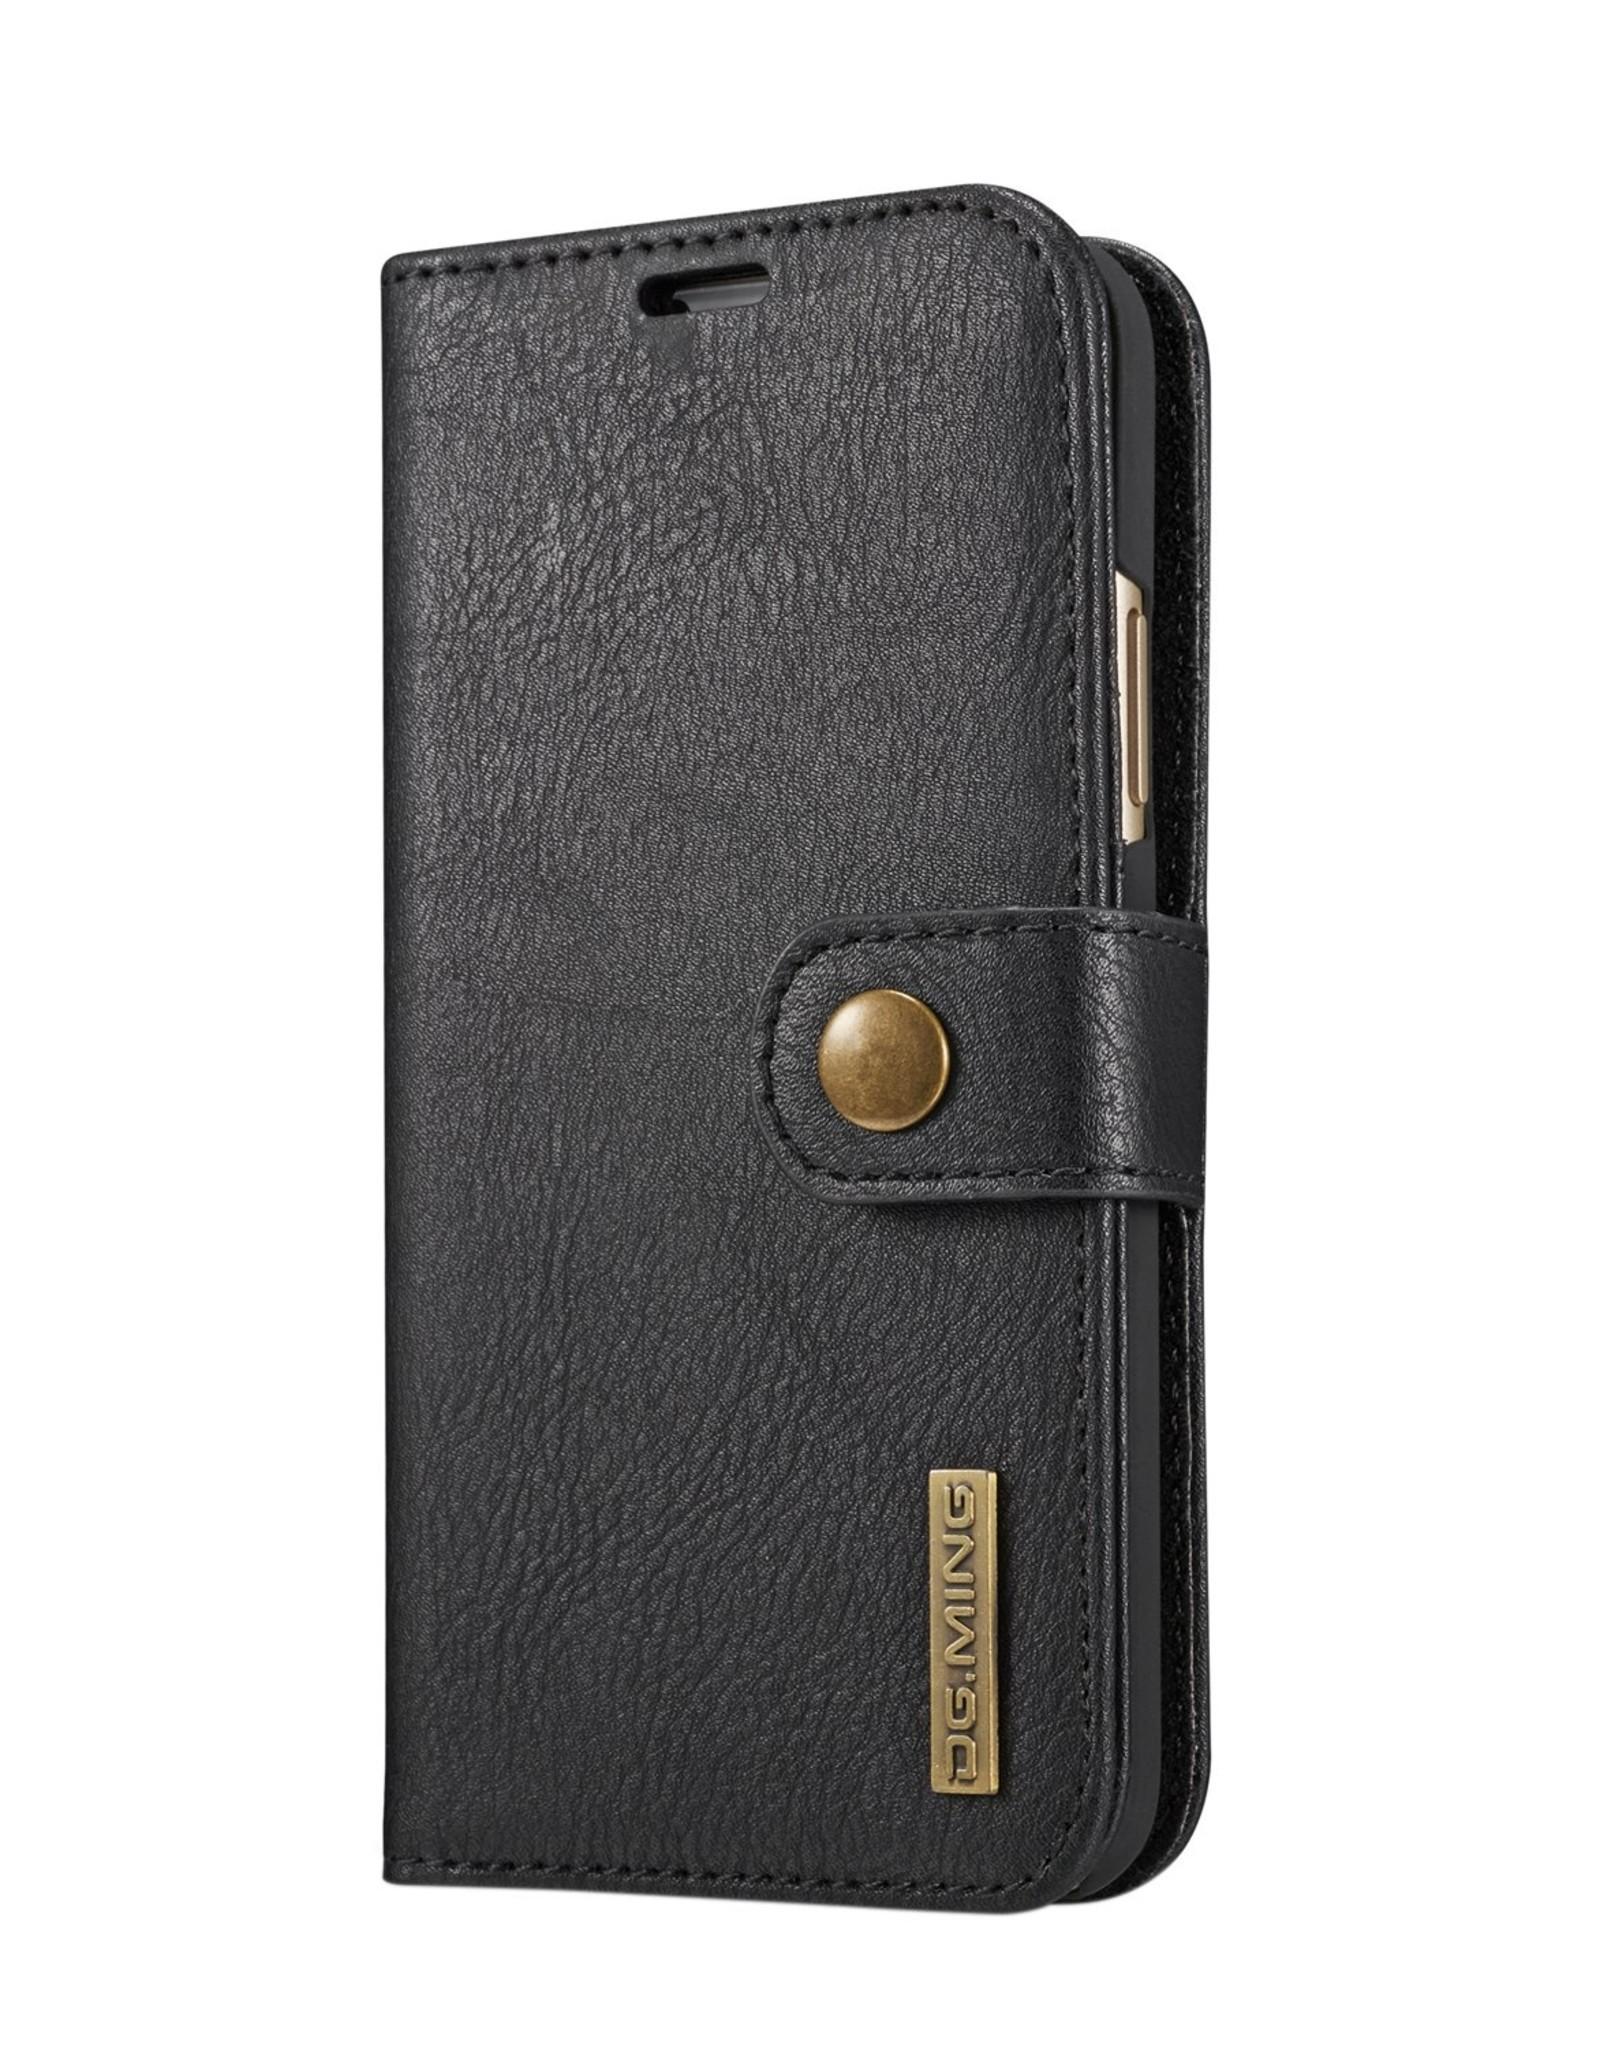 D.G Ming Retro Style Wallet Case